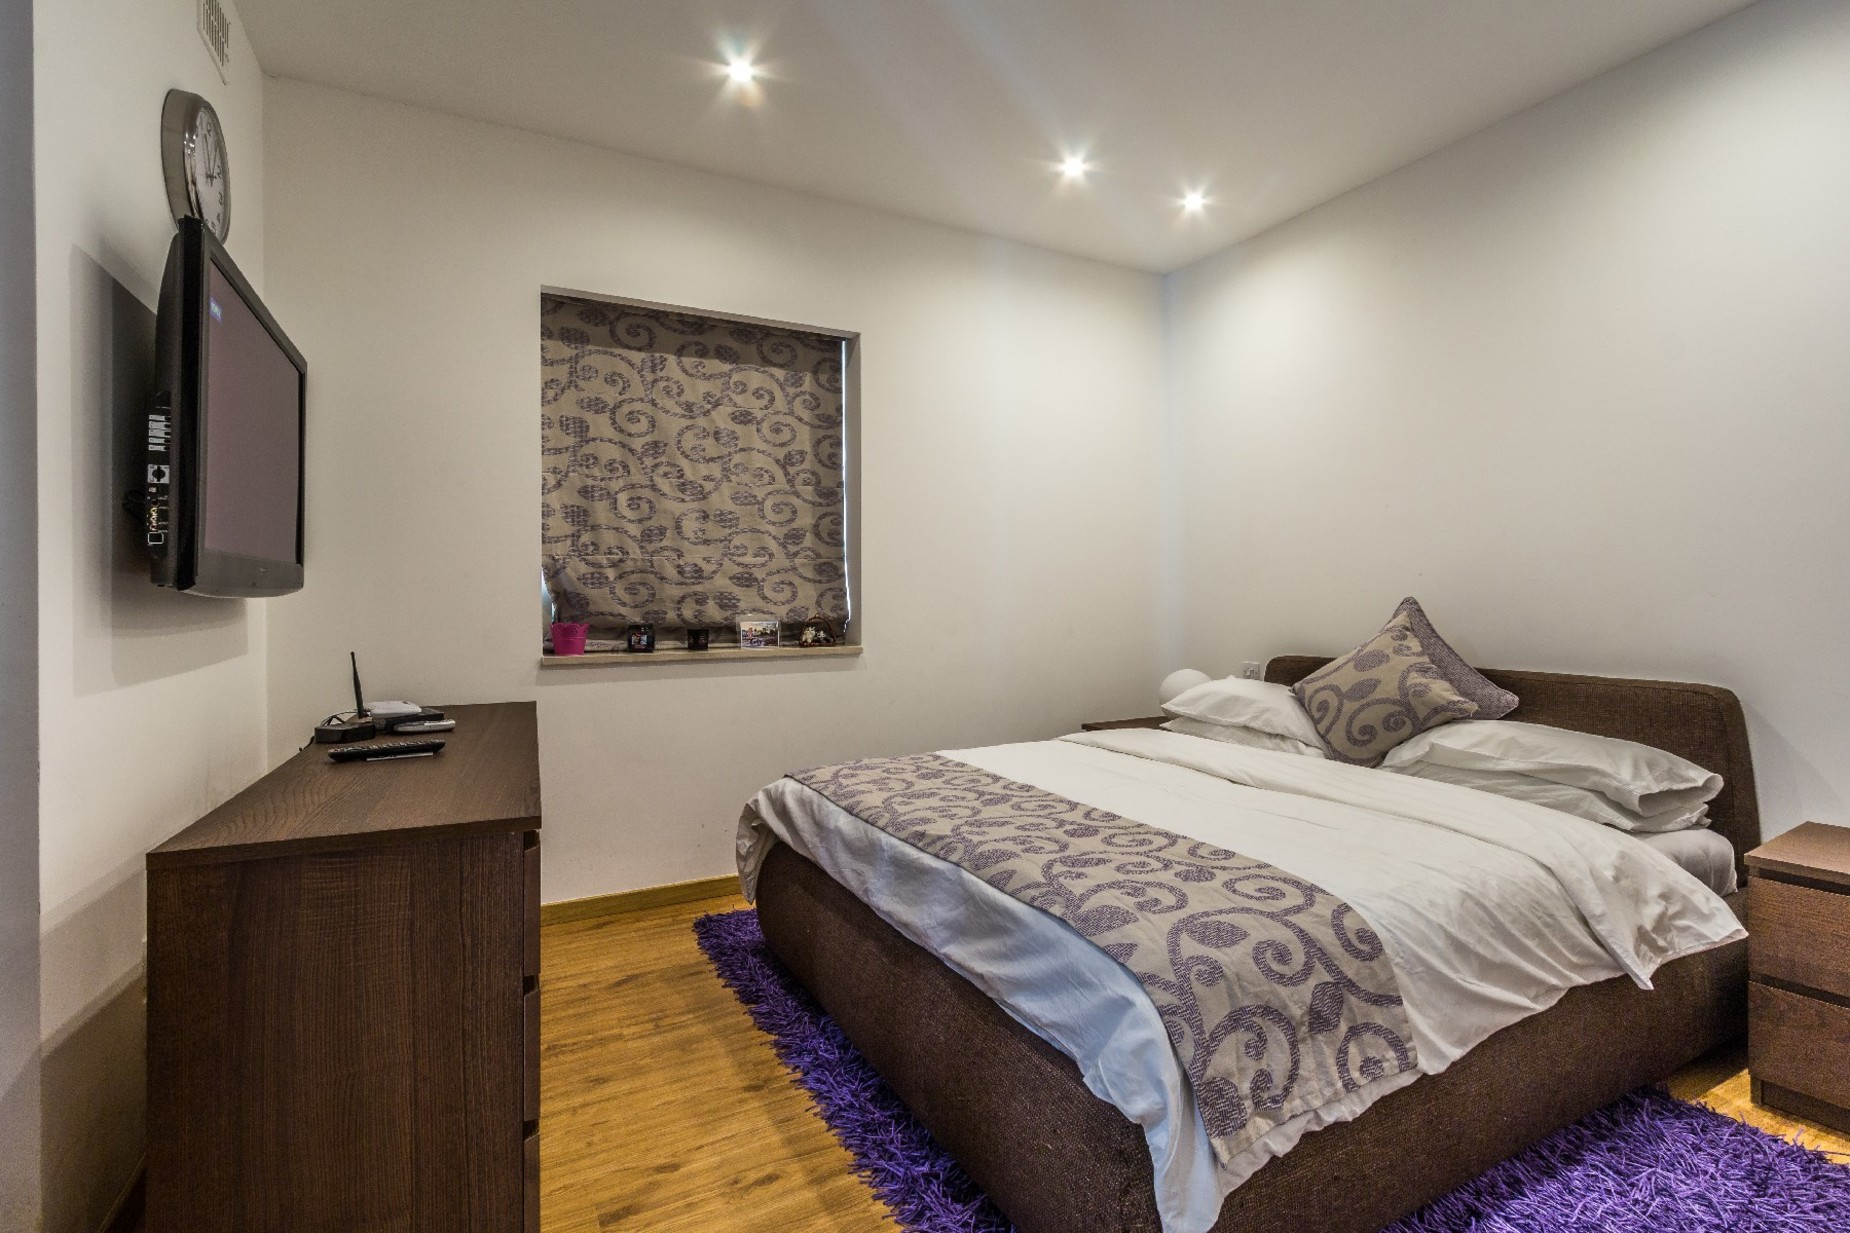 4 bed Apartment For Rent in Sliema, Sliema - thumb 12